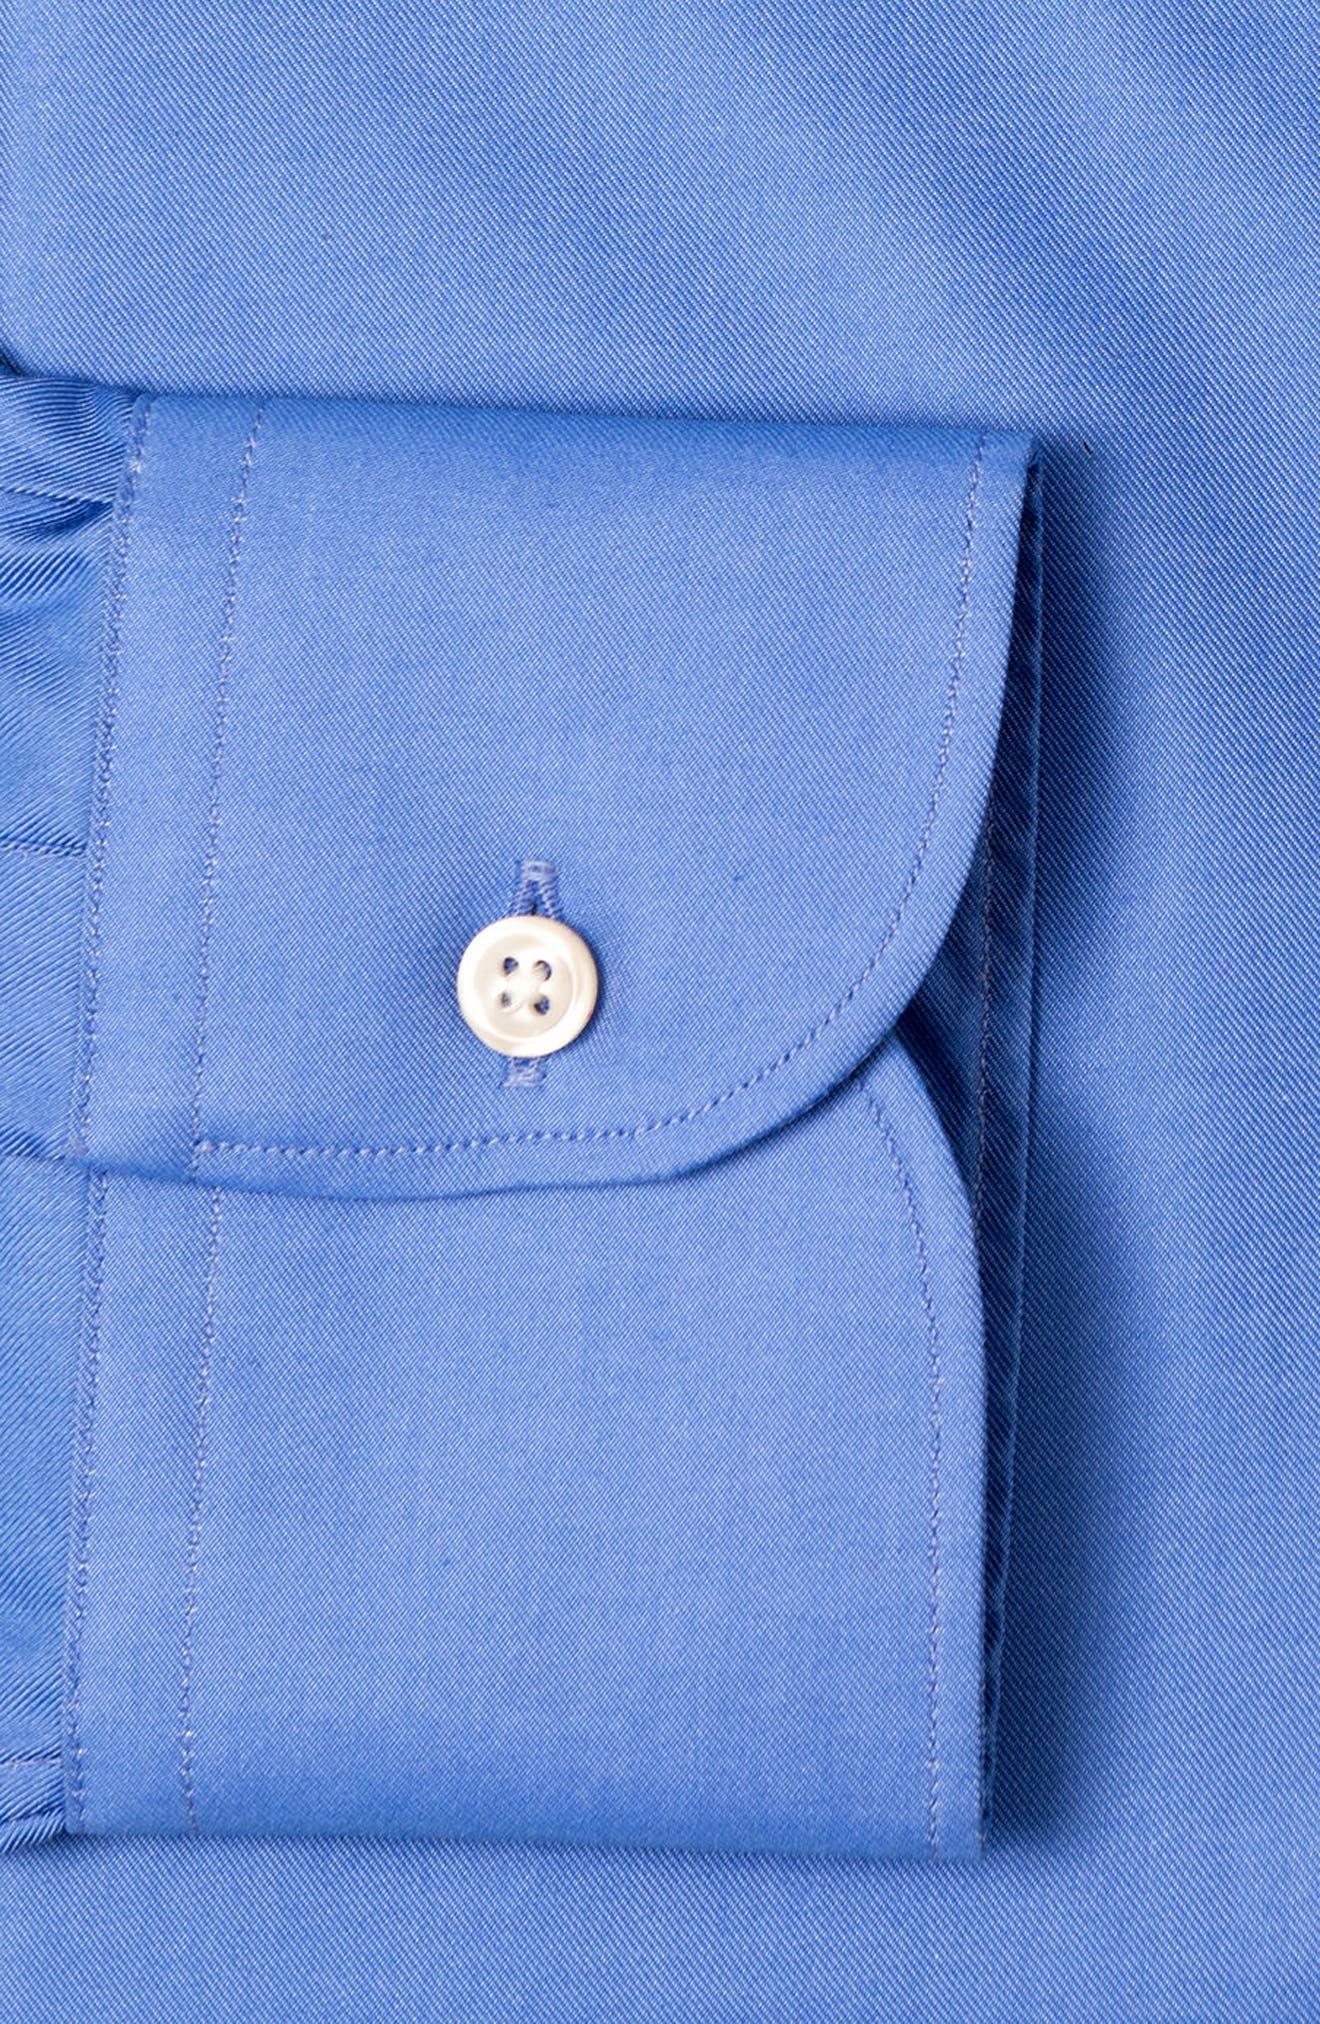 Regular Fit Solid Dress Shirt,                             Alternate thumbnail 6, color,                             DARK BLUE